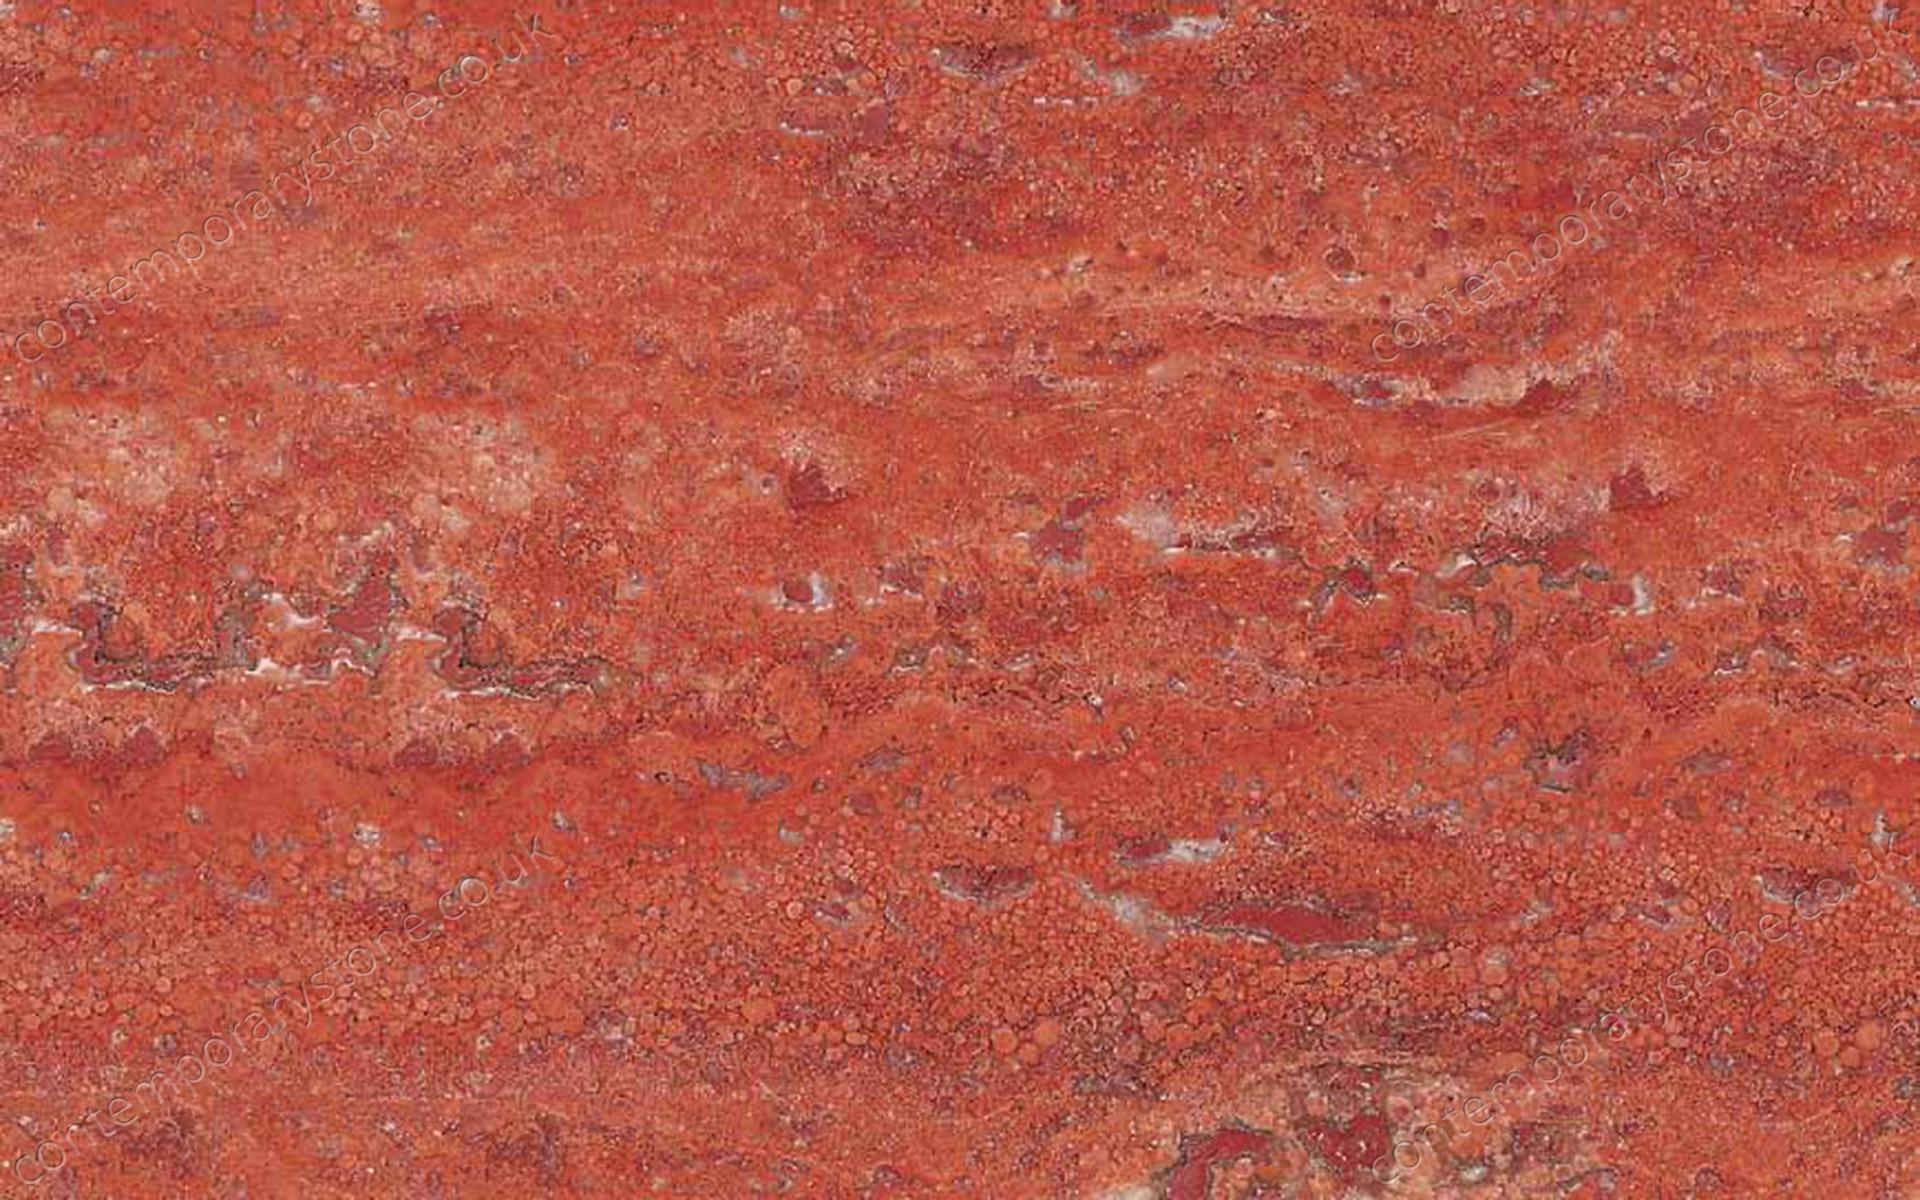 Travertino Rosso travertine close-up